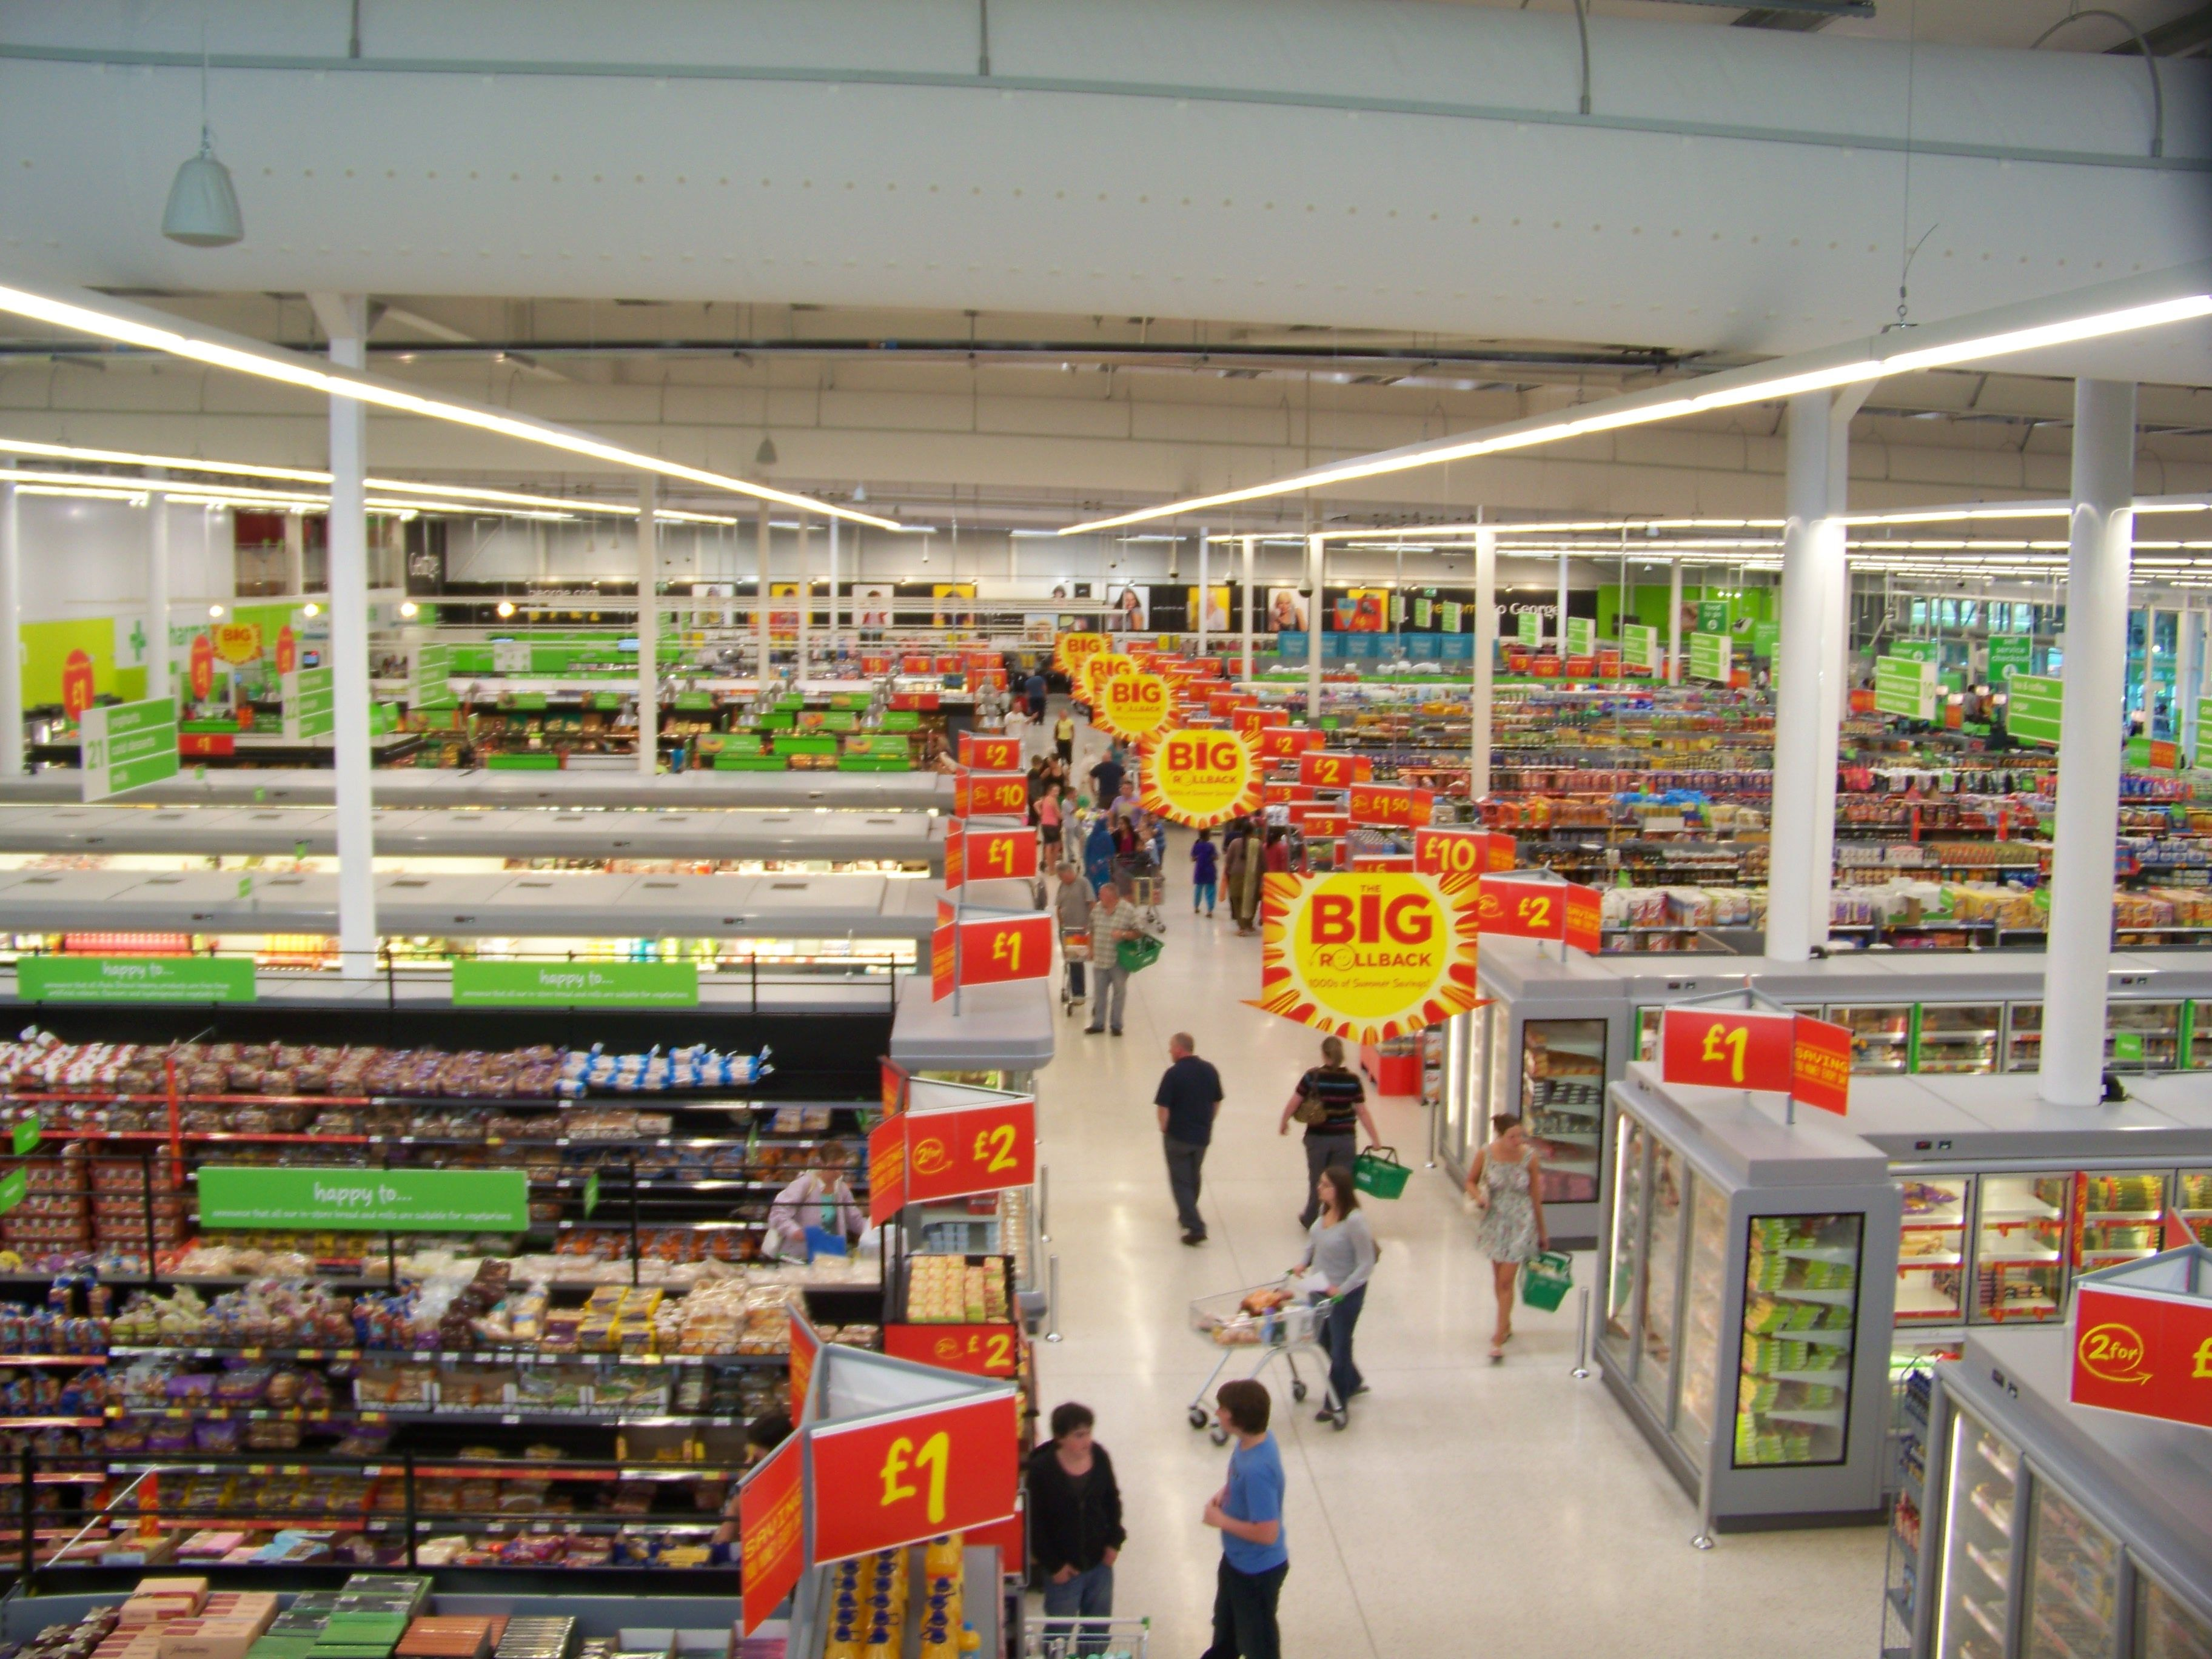 Grocery Store Aisle Organization